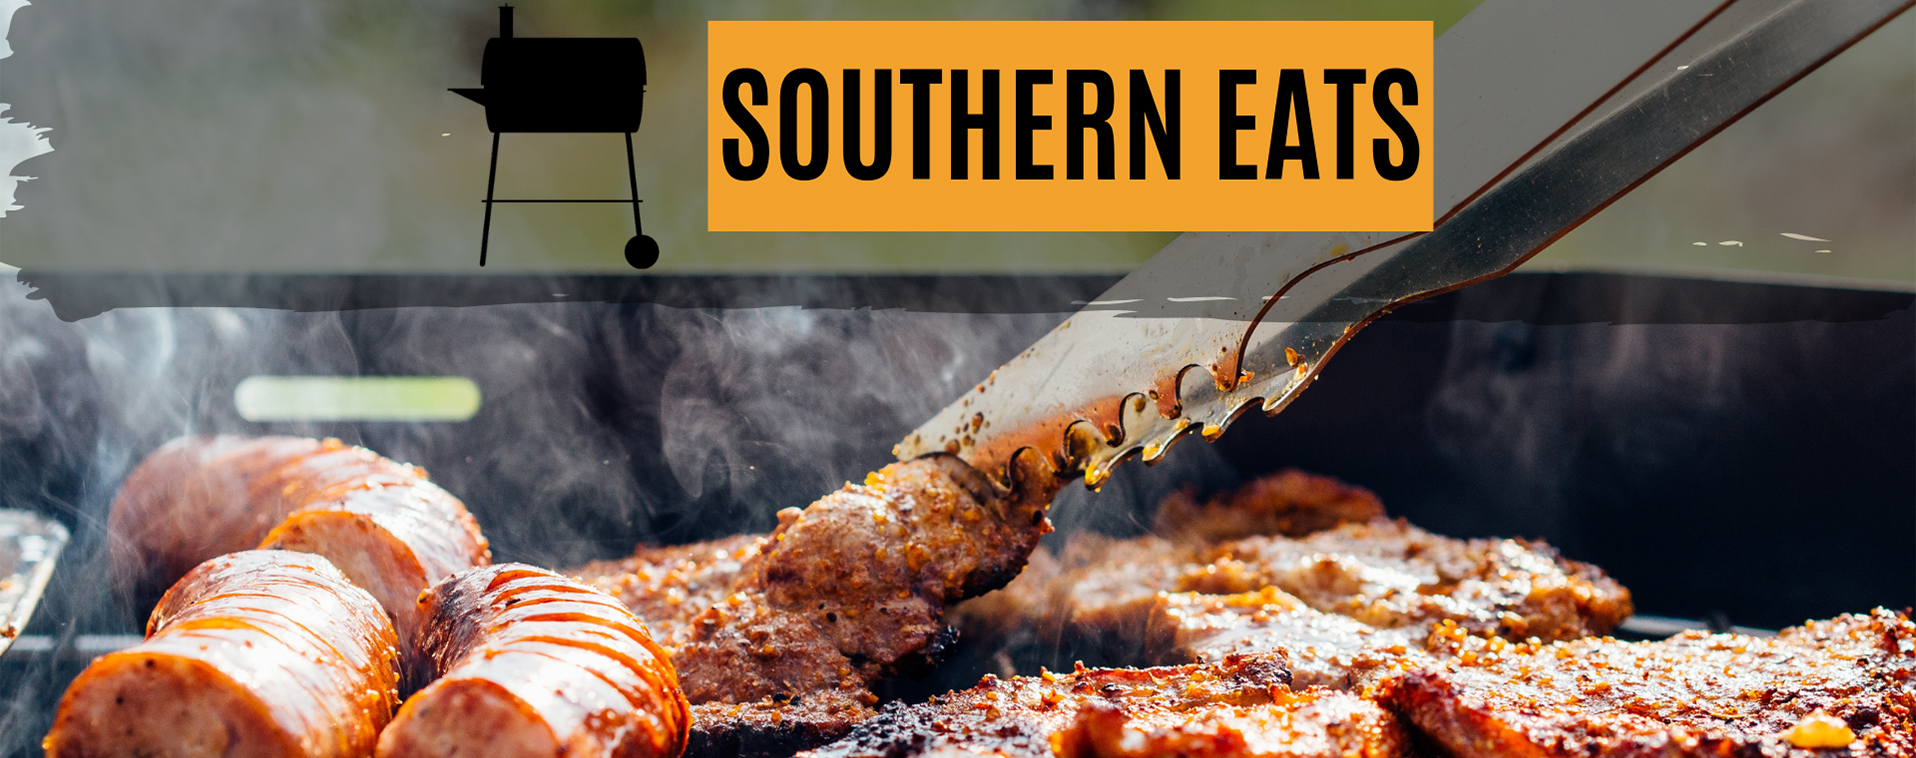 Southern Eats 1916x758